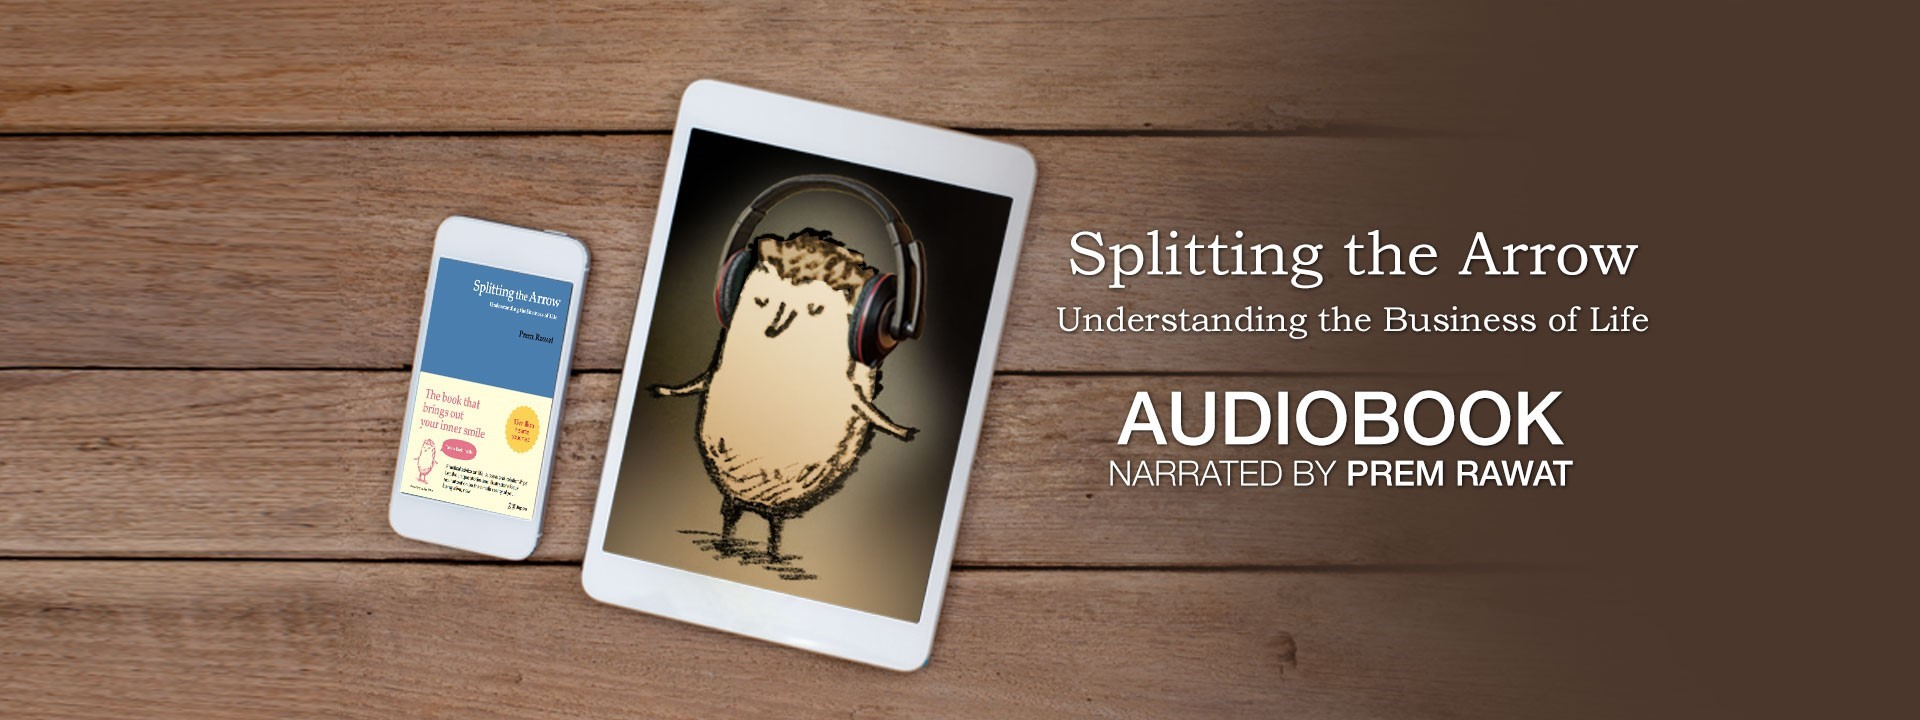 Splitting the Arrow (Audiobook)